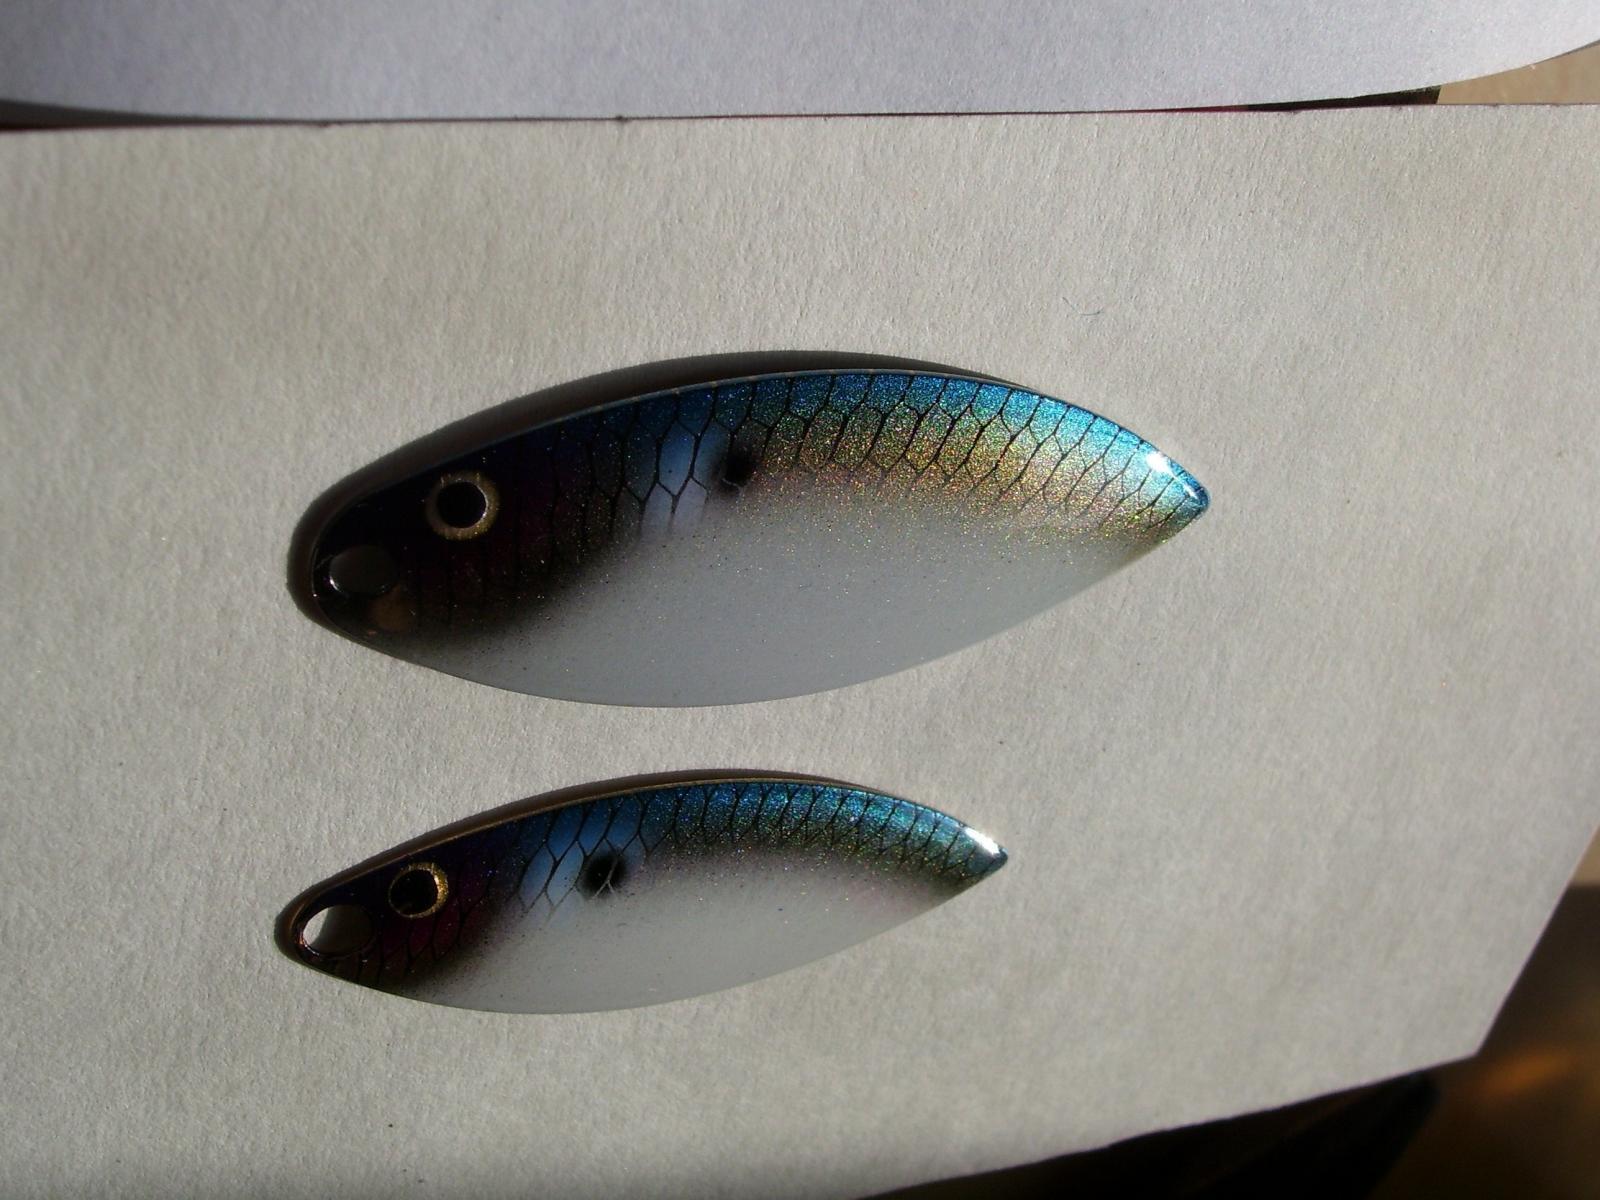 New Blades